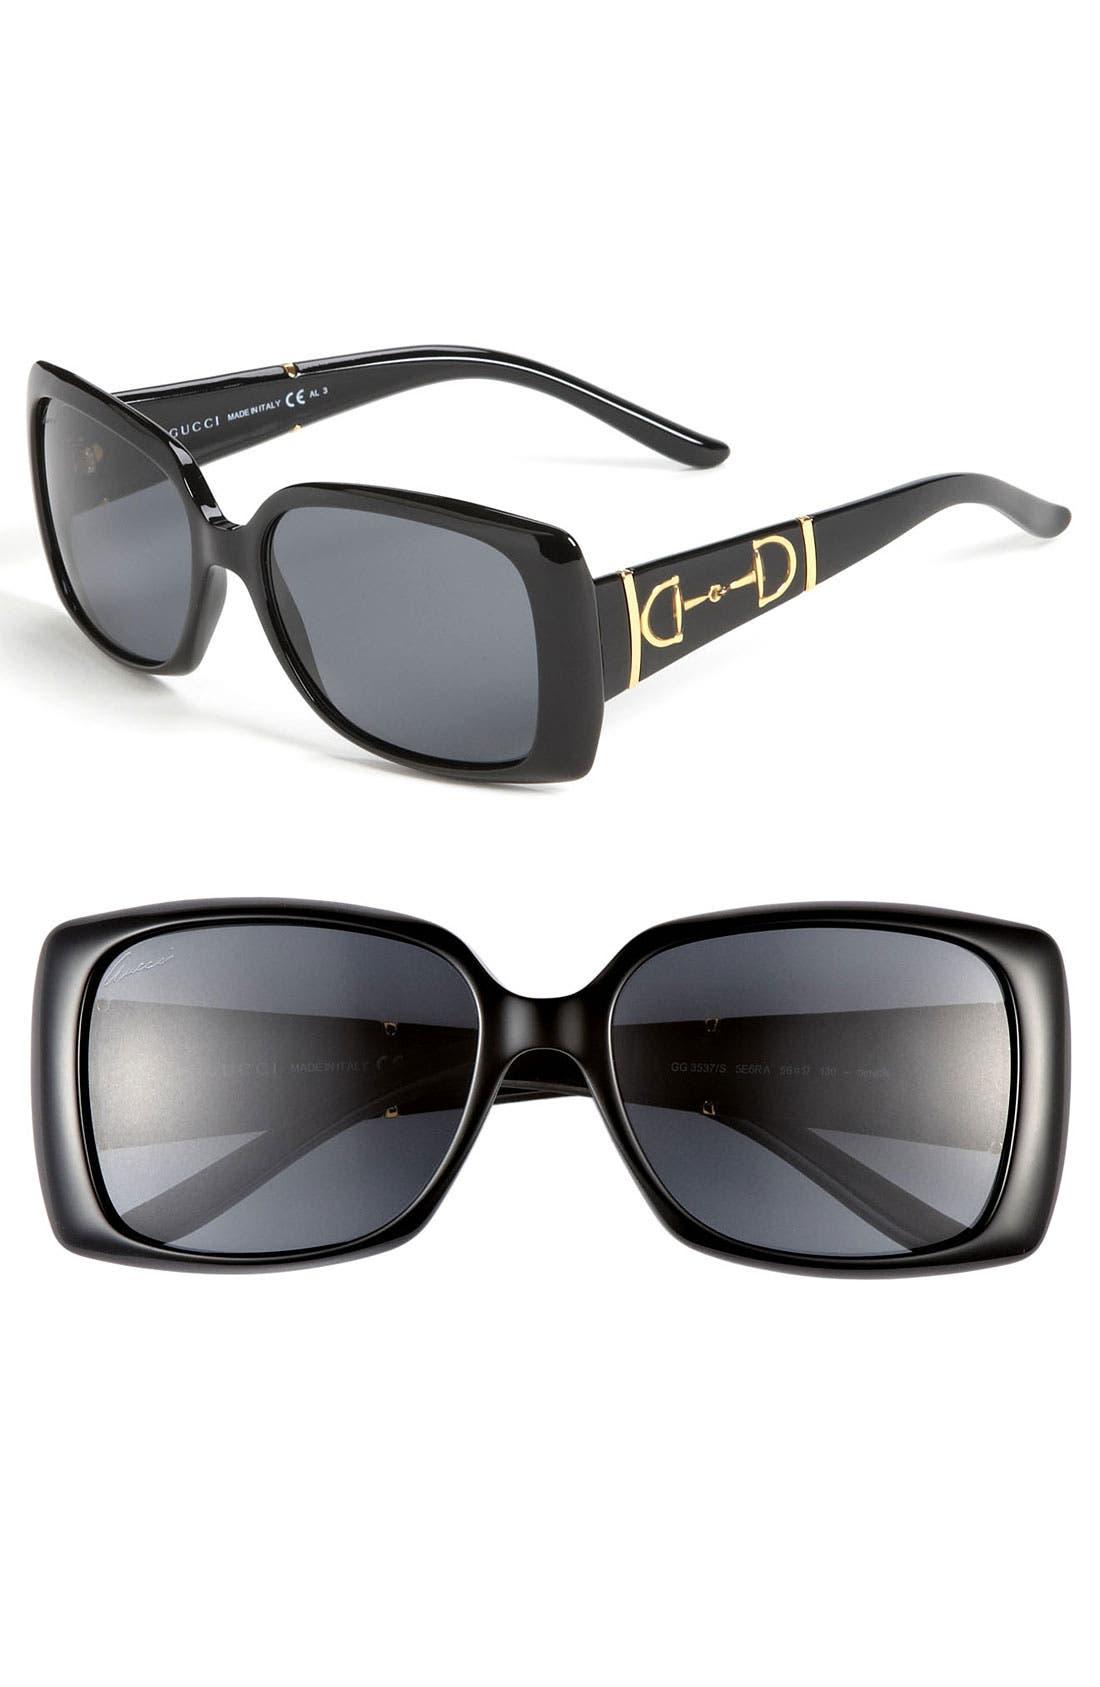 Main Image - Gucci Polarized Sunglasses